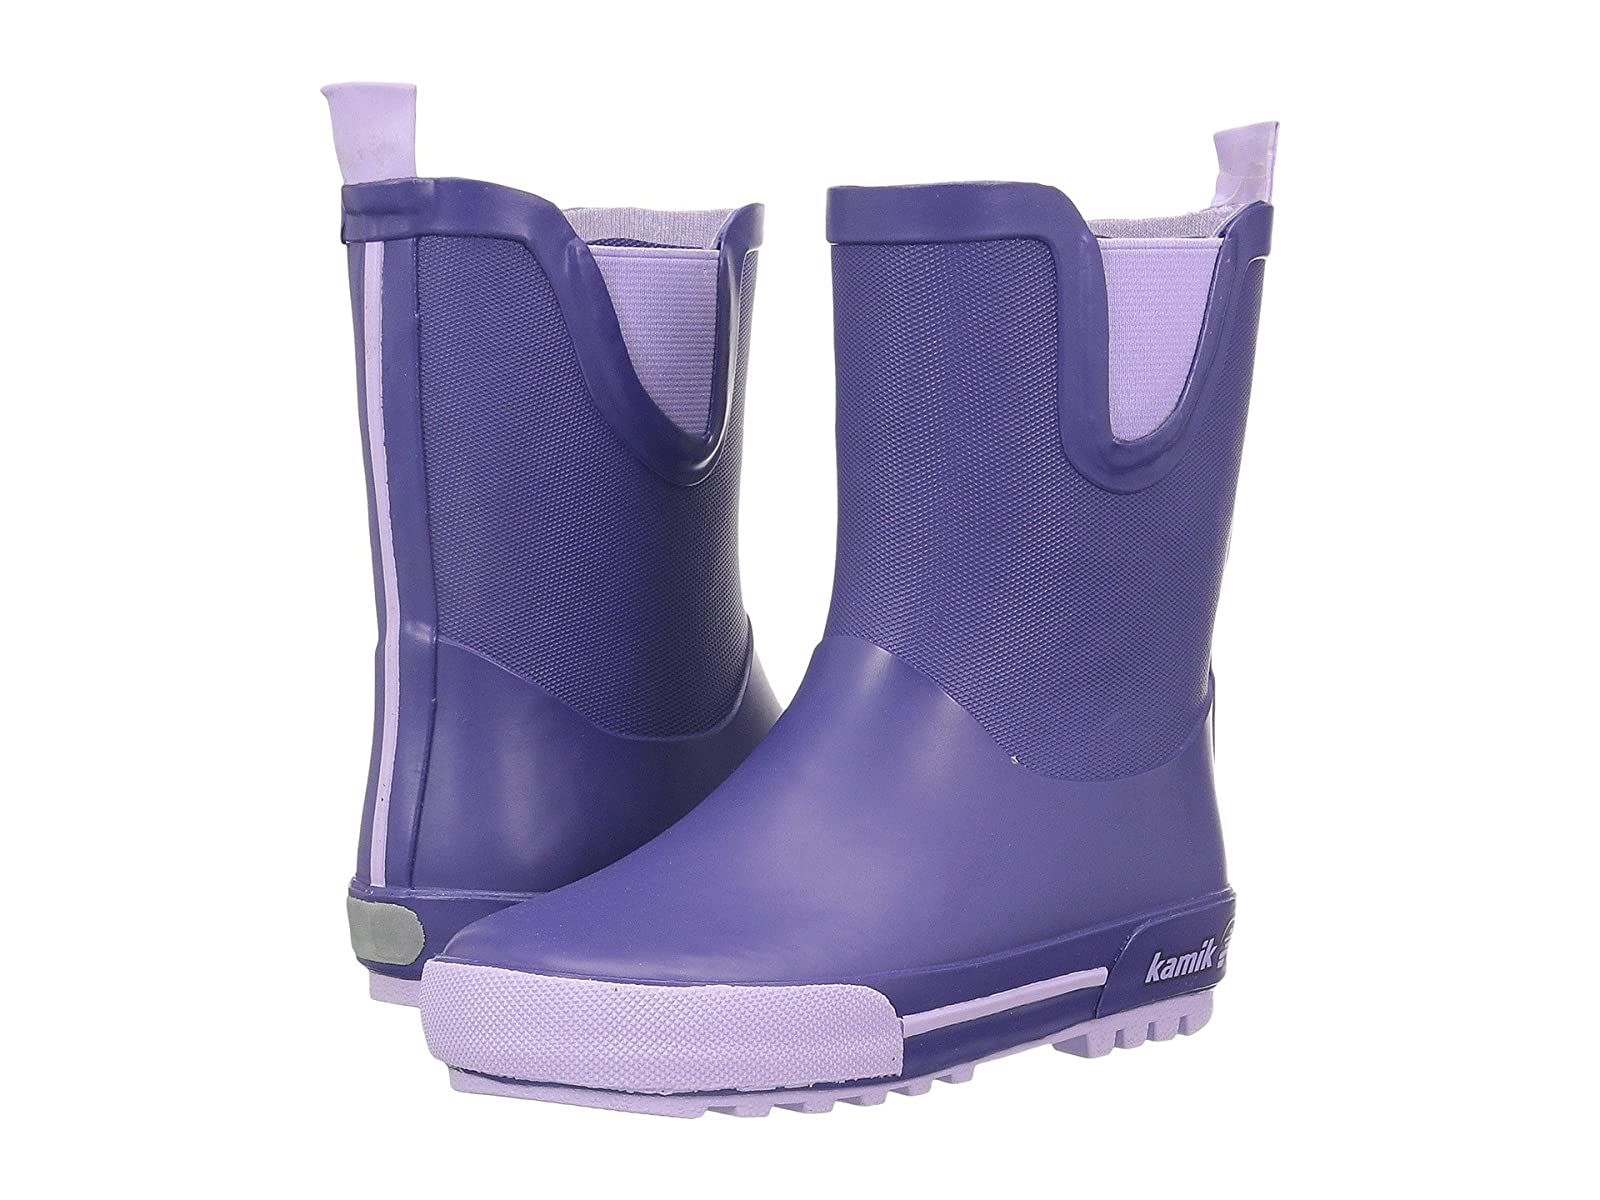 Kamik Kids Rainplay (Toddler)Affordable and distinctive shoes